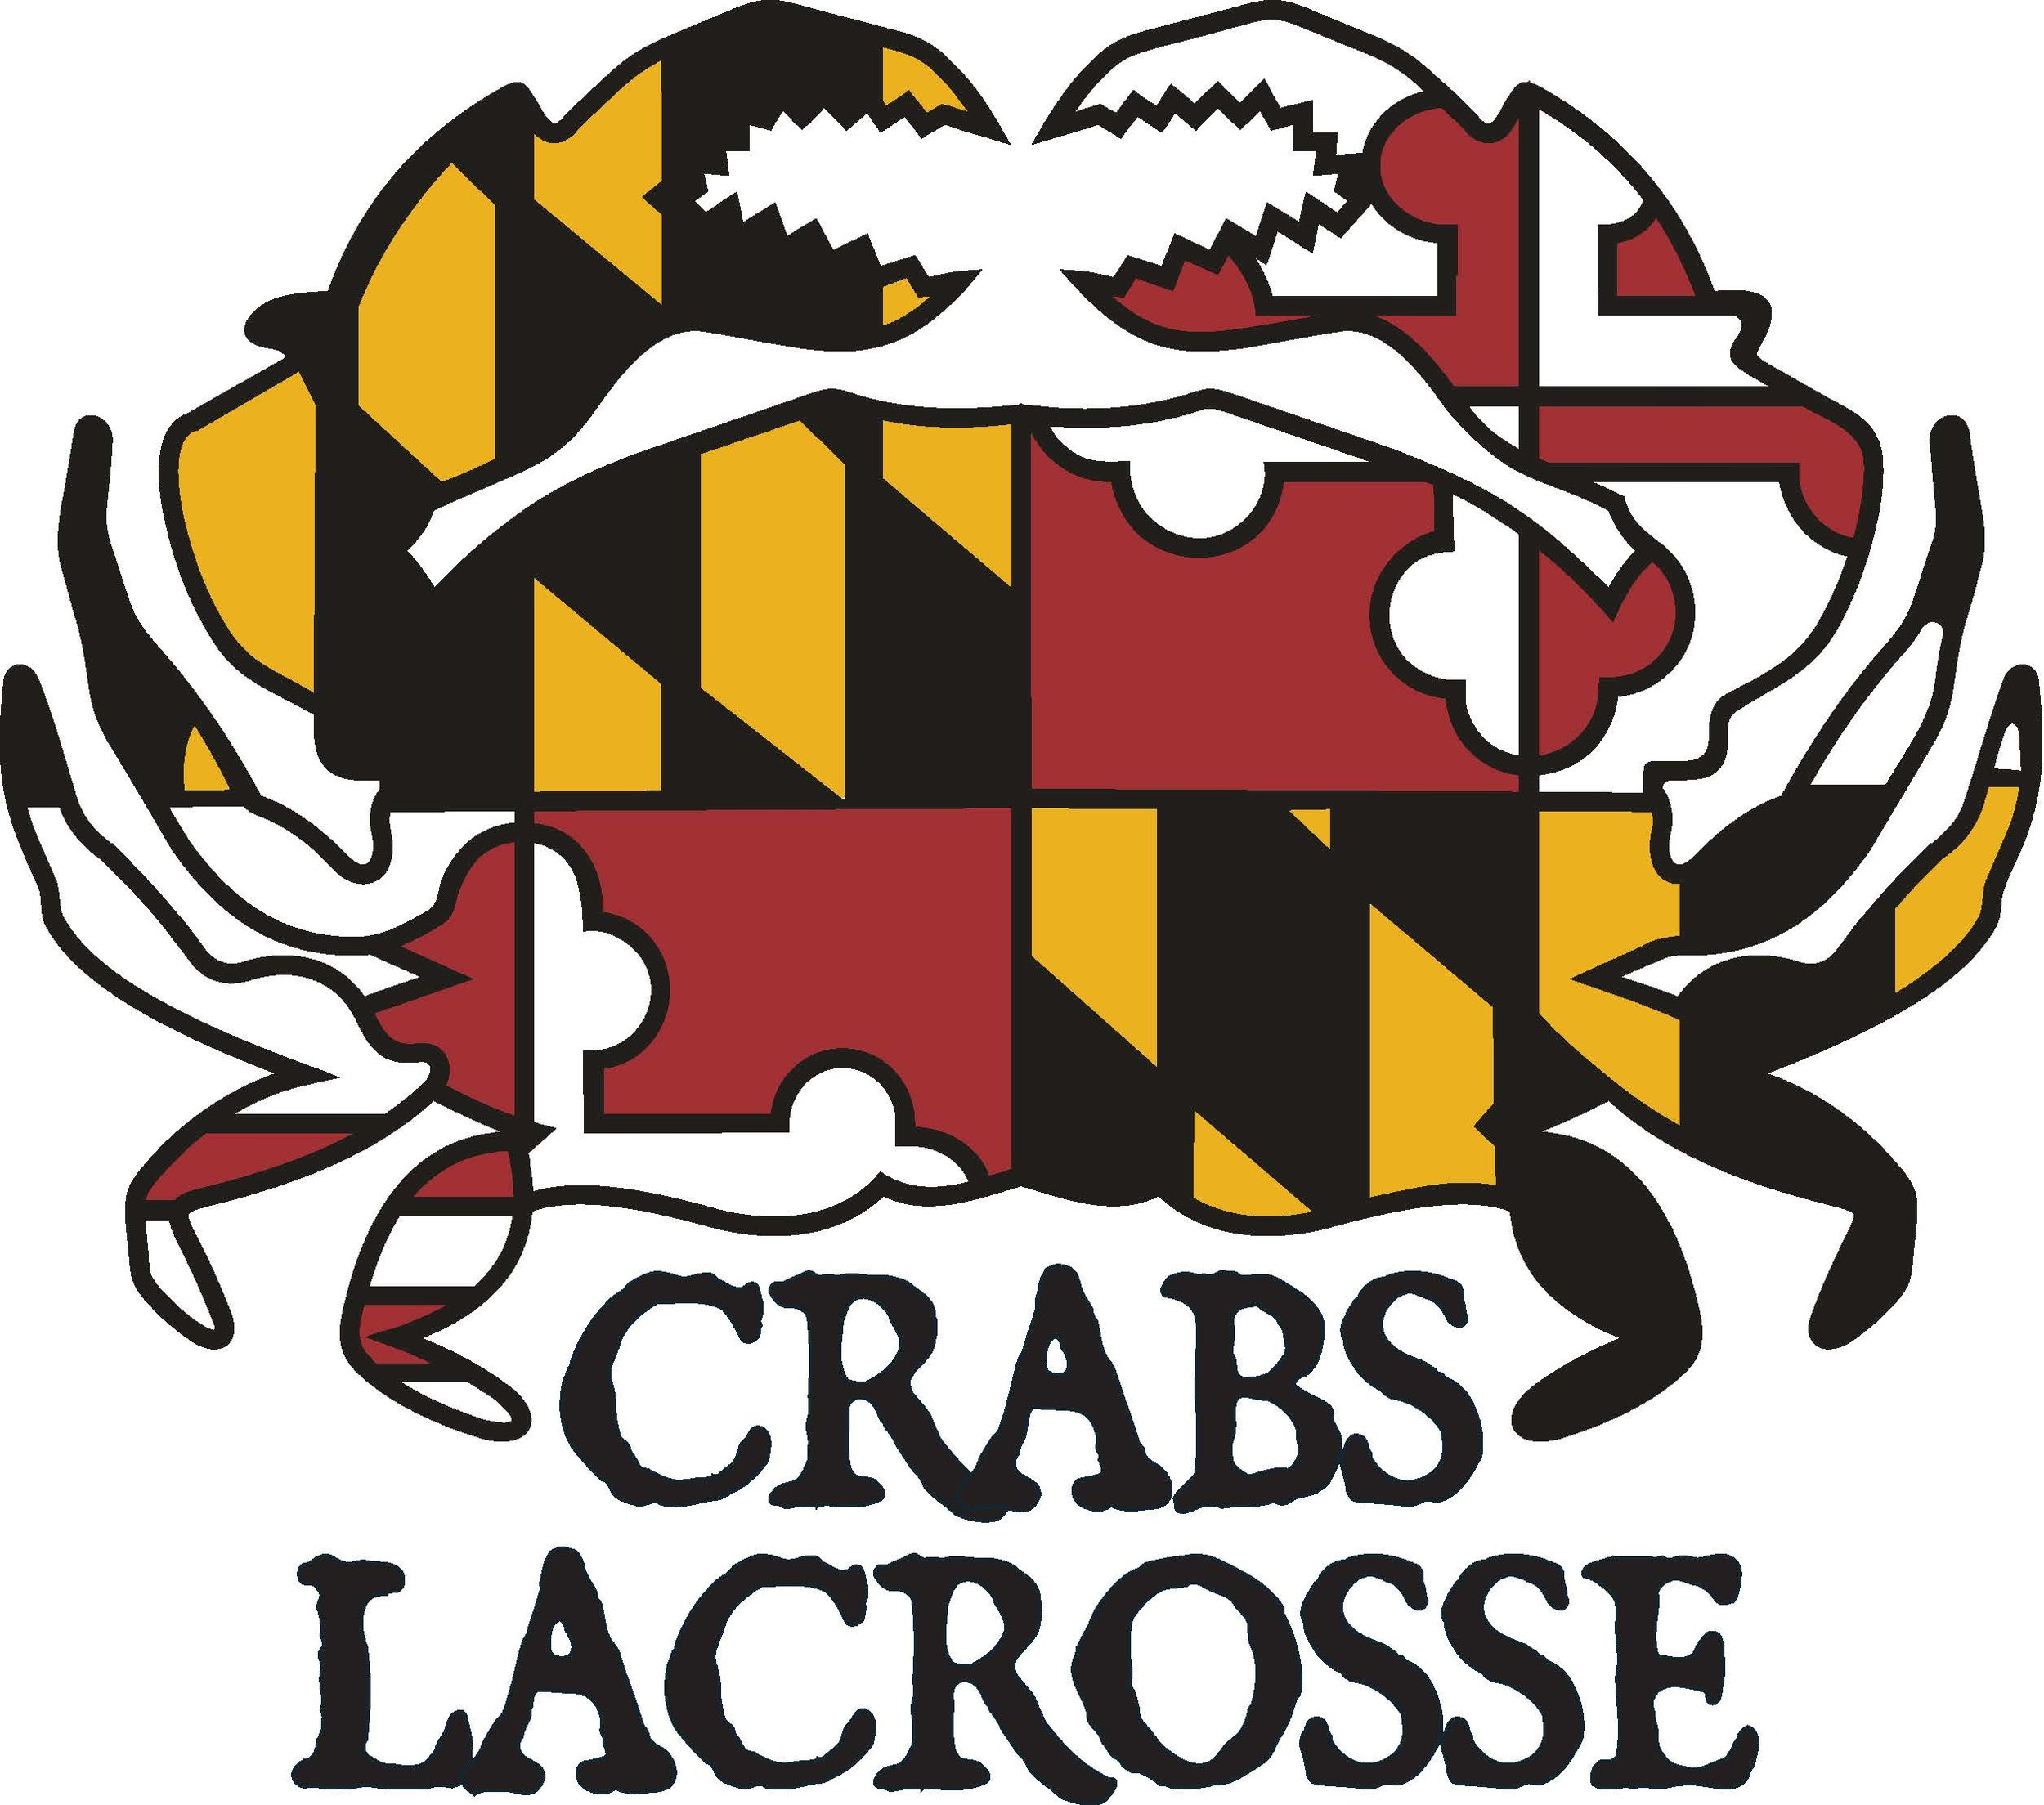 crabs logo.jpg